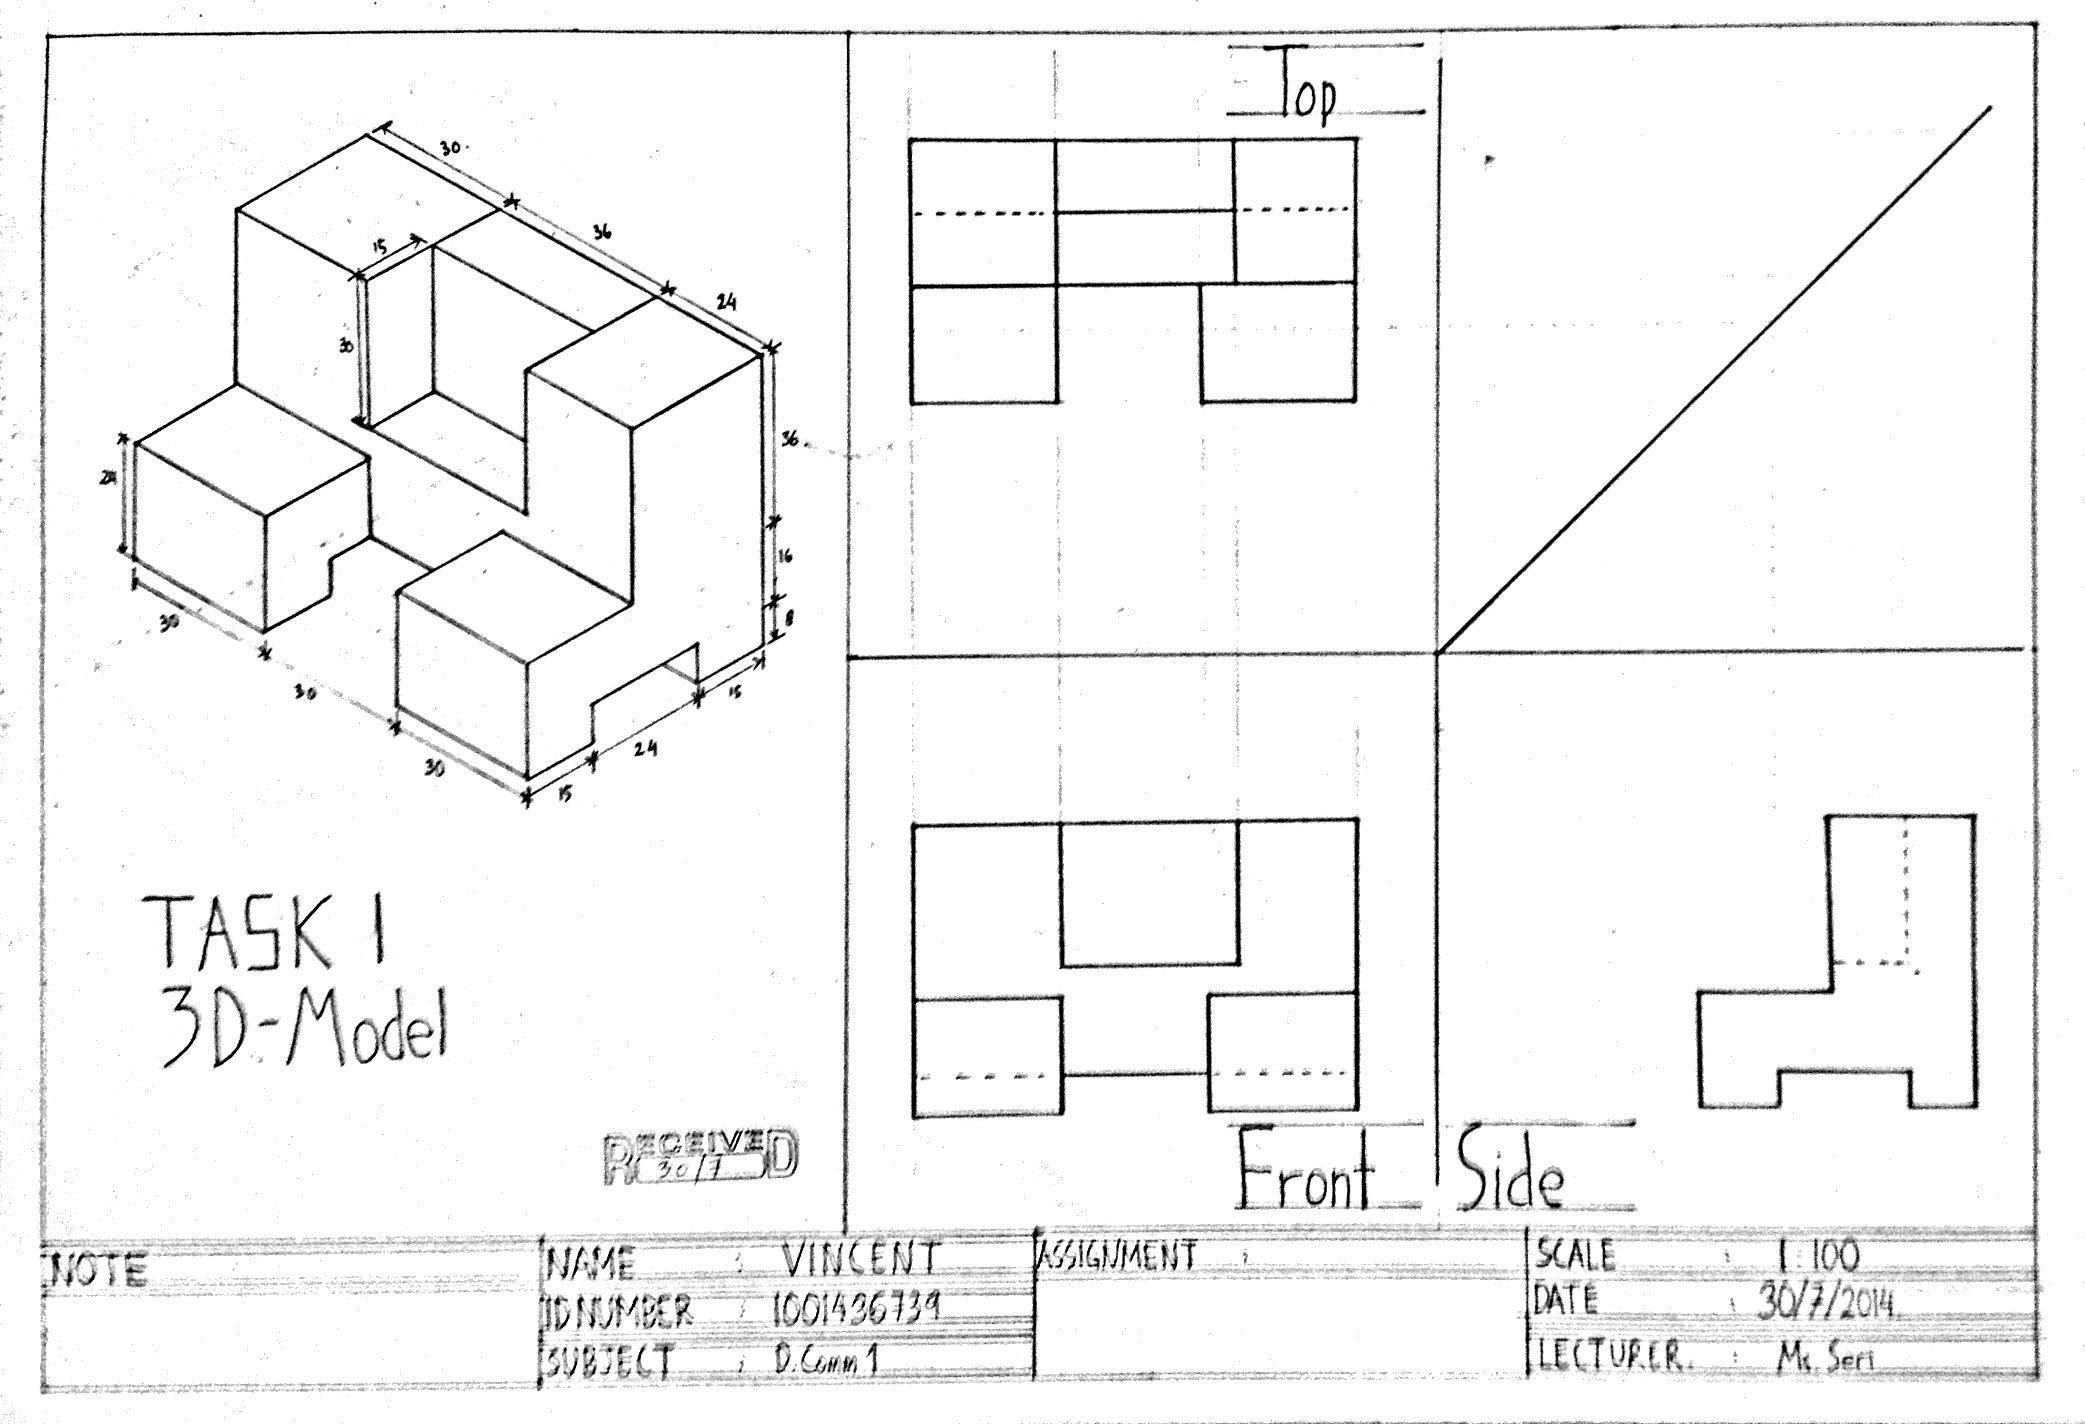 Design Communication 1 Vincentlunia